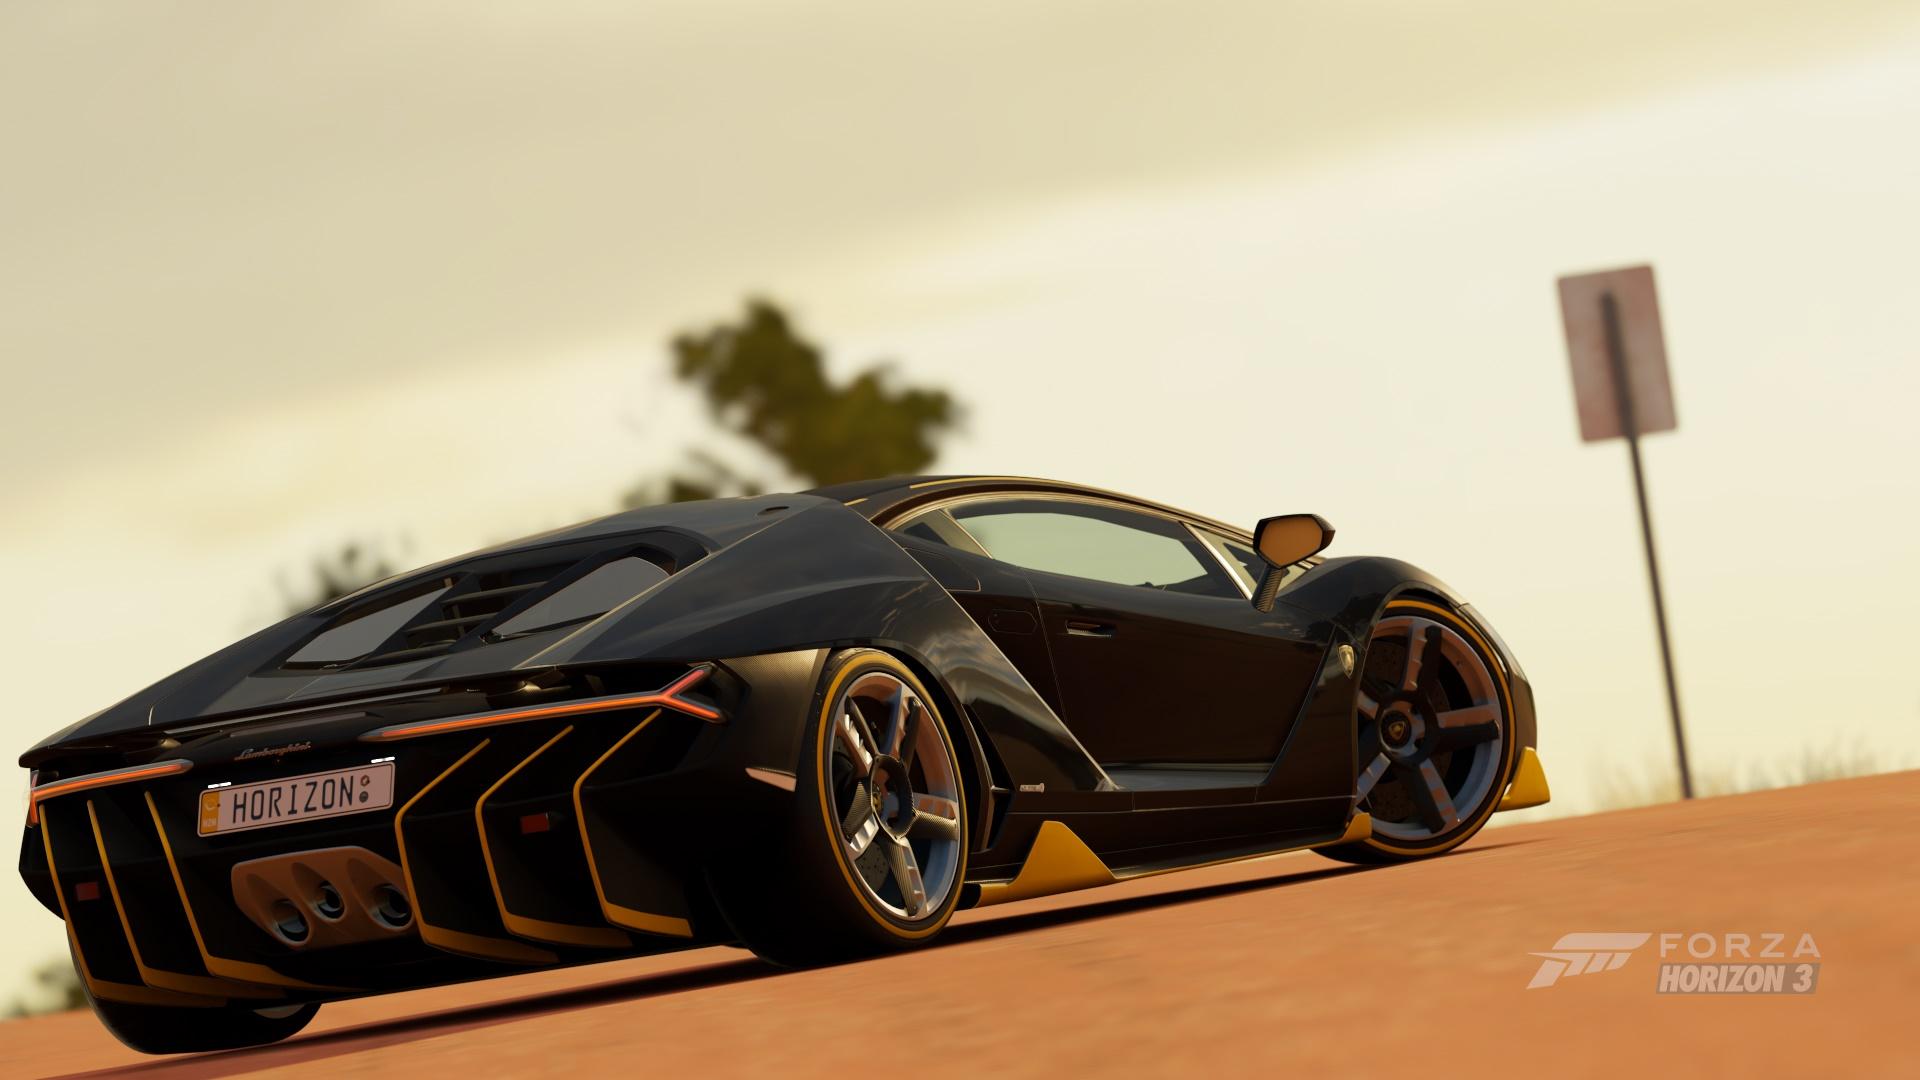 2016 Lamborghini Centenario Lp 770 4 Hd Wallpaper Background Image